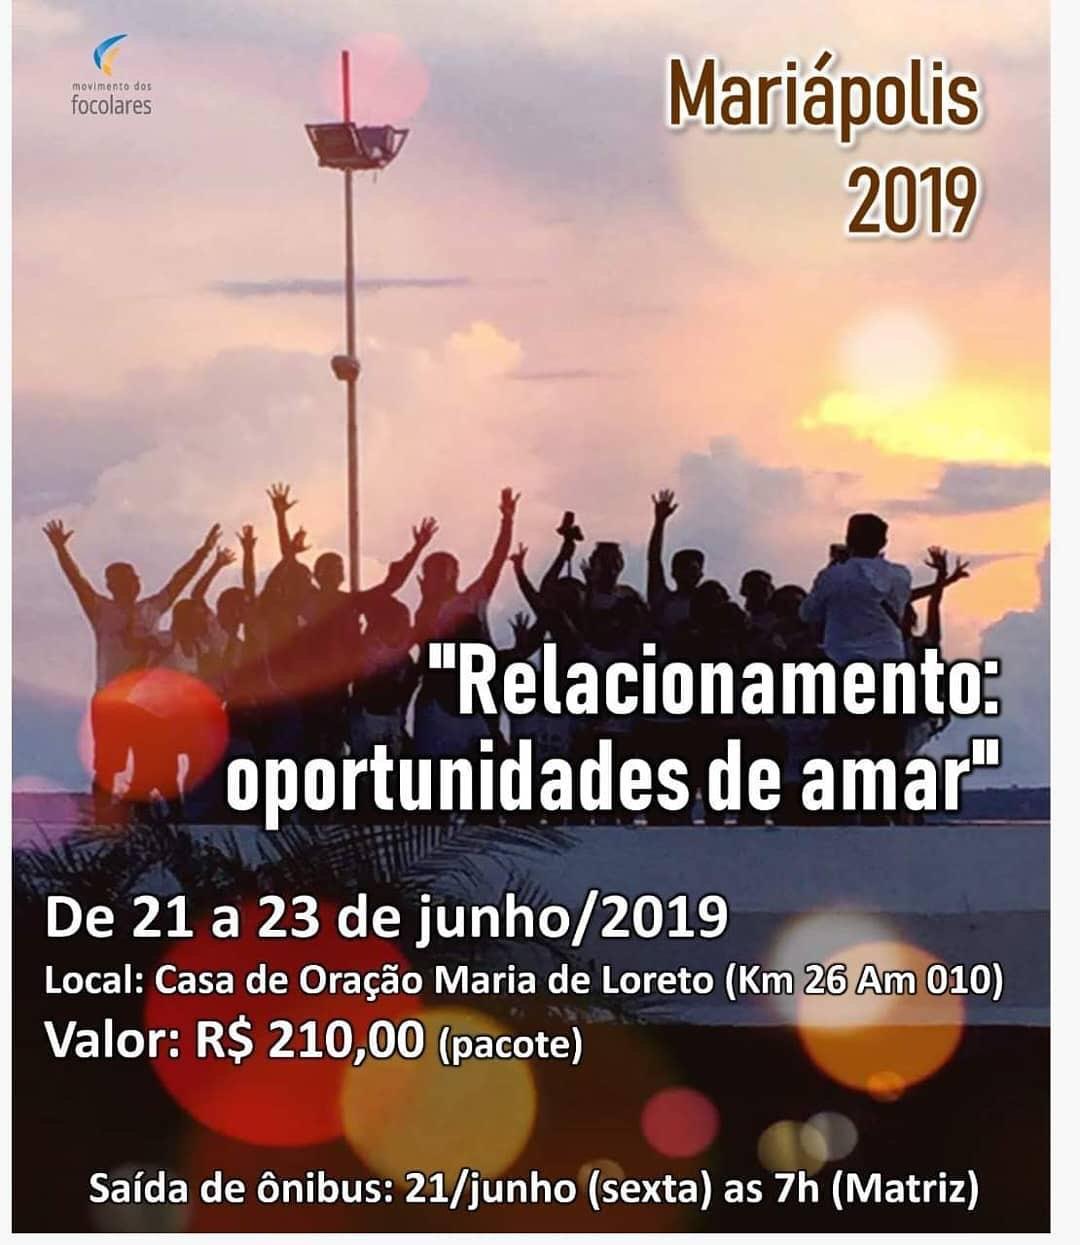 Mariápolis em Manaus 2019